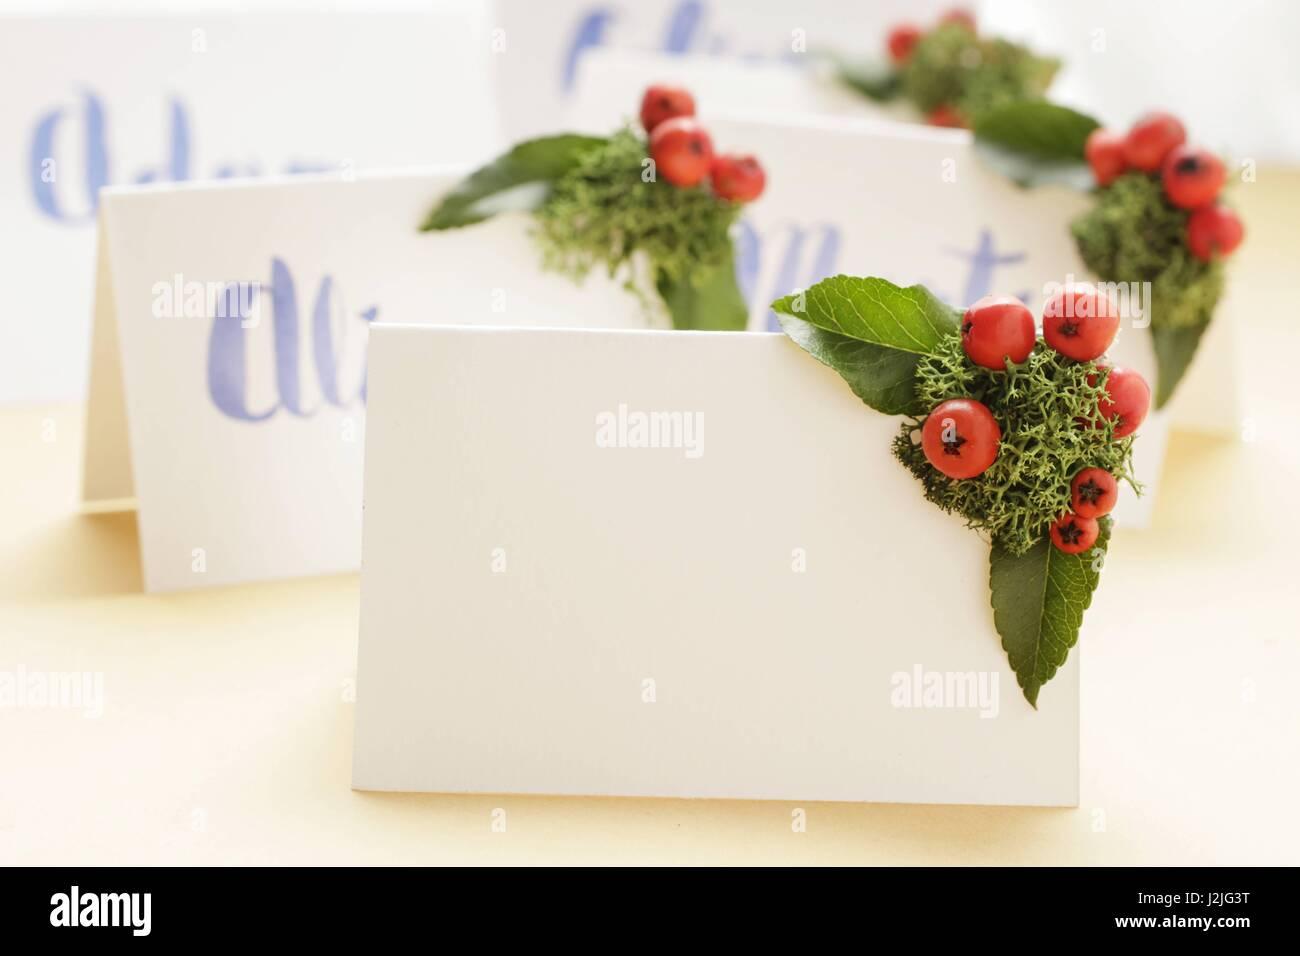 Wedding Place Name Cards Handwritten Imágenes De Stock